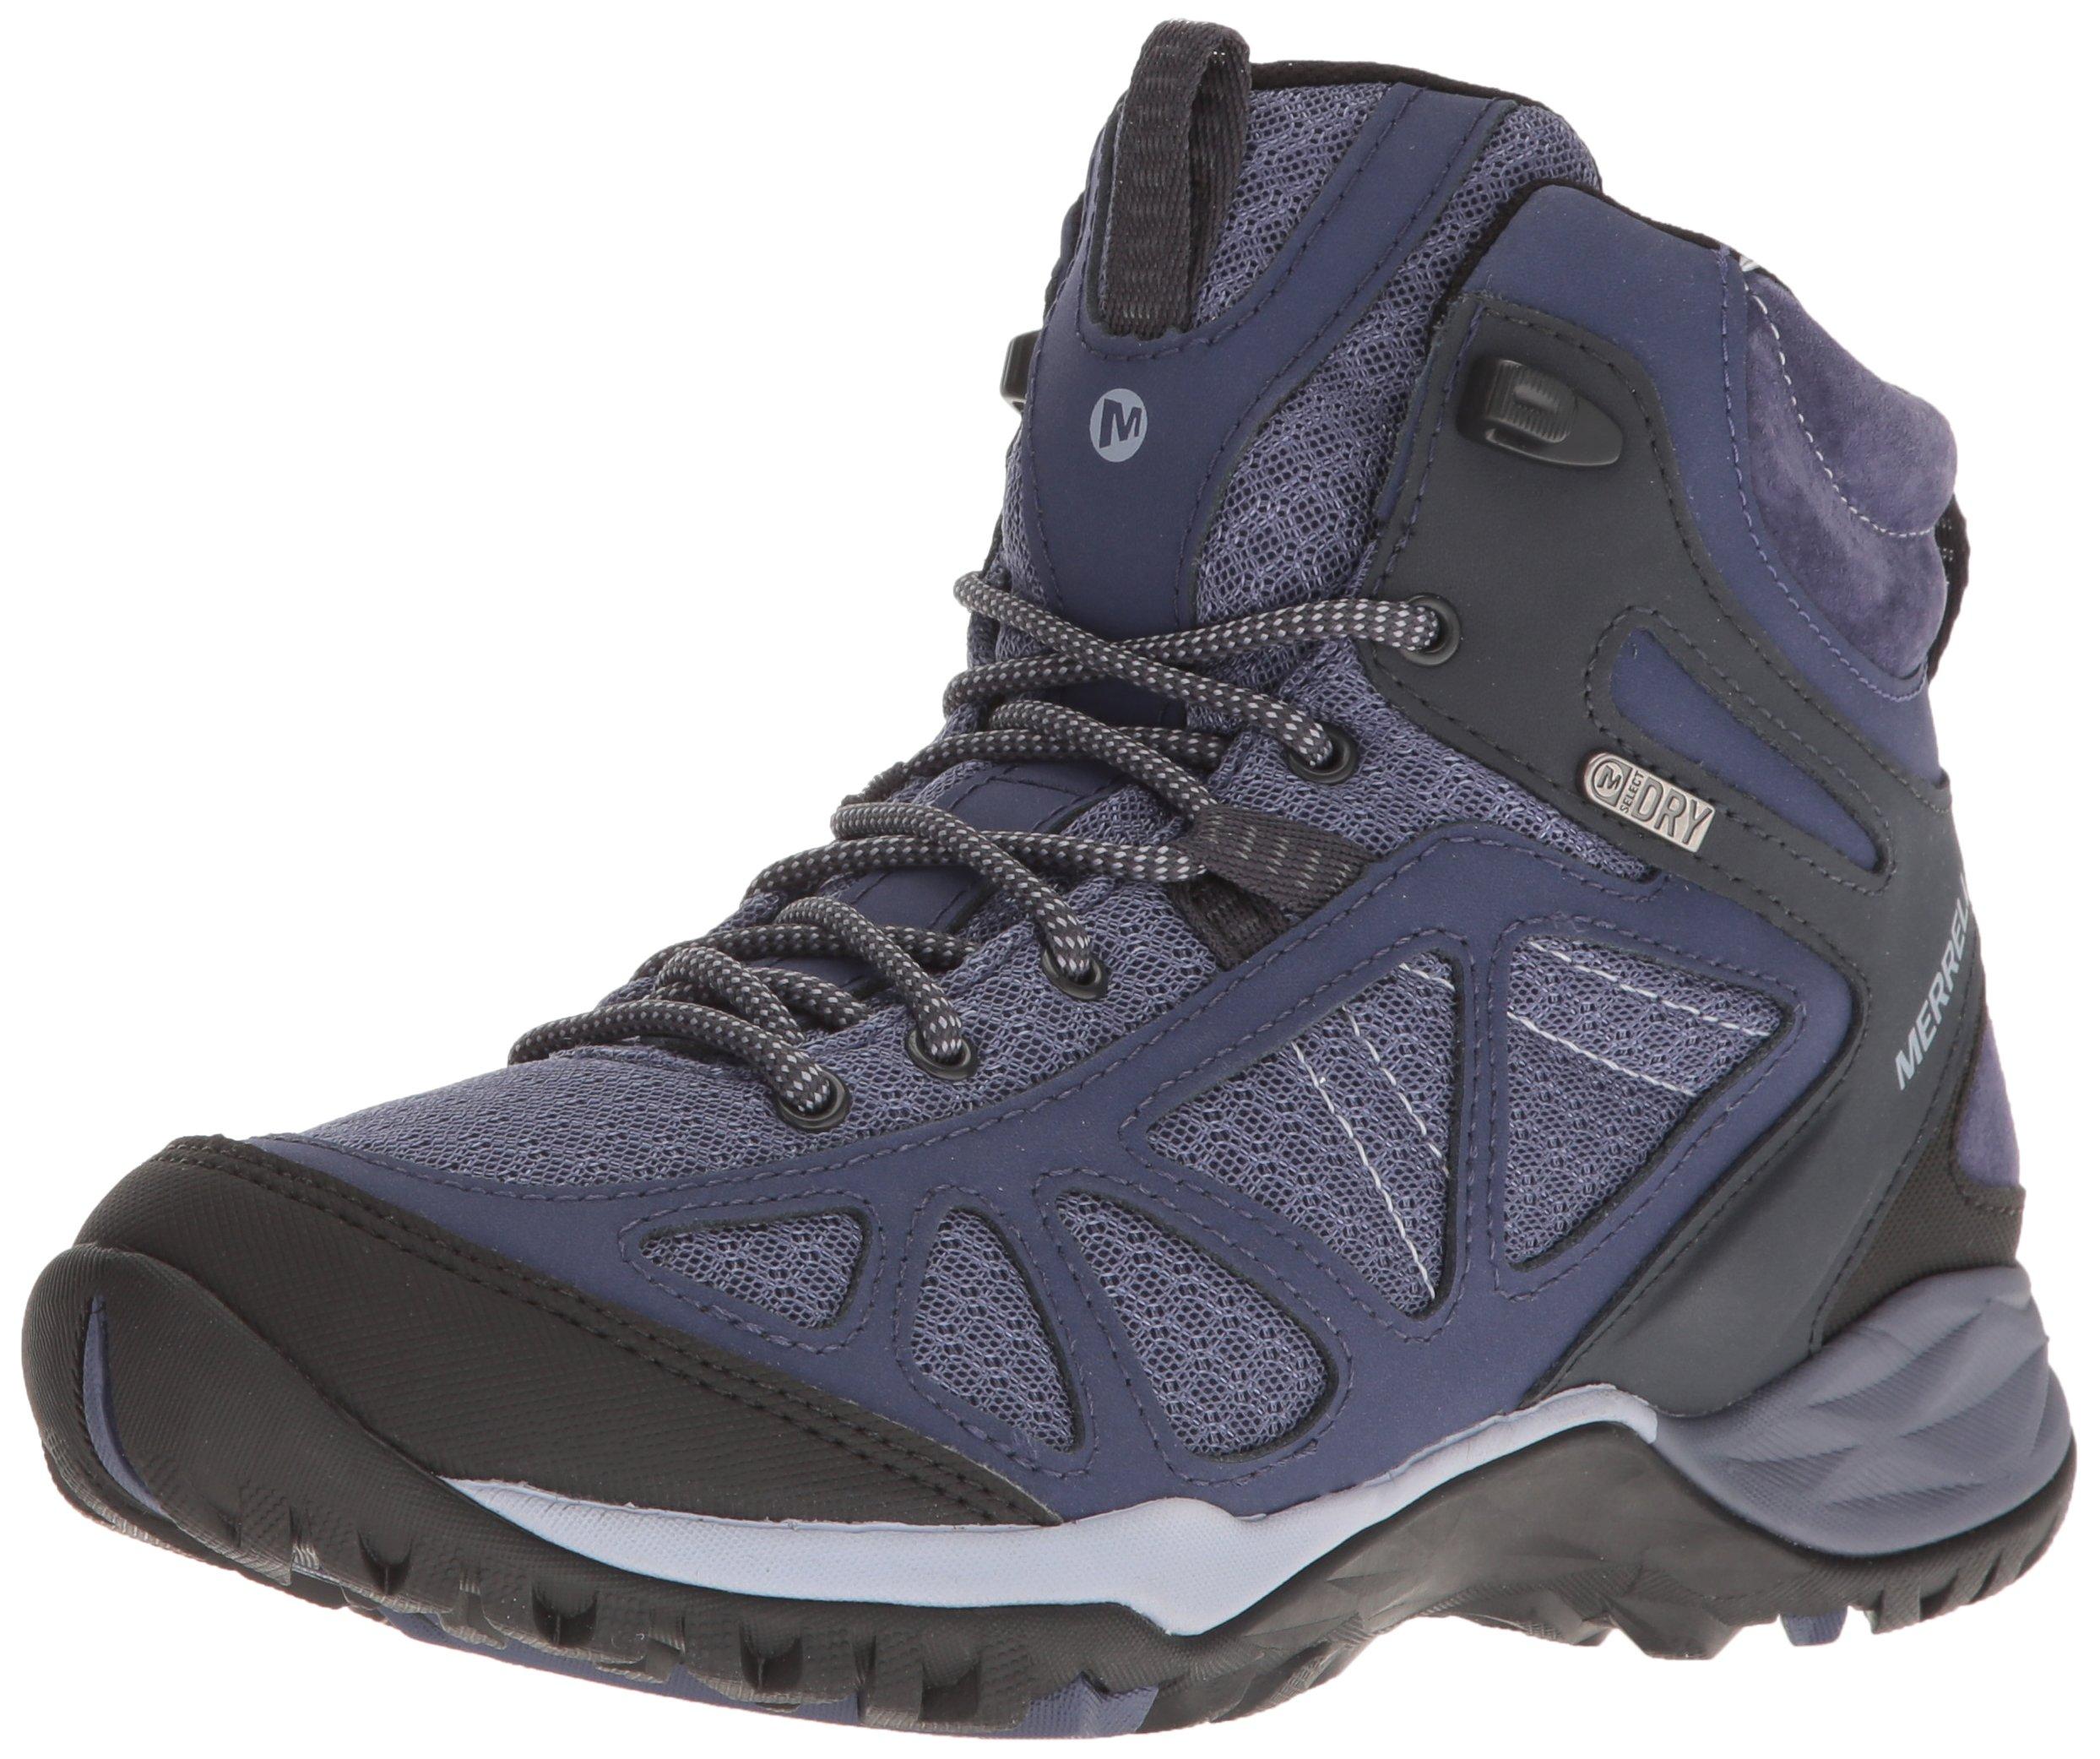 Merrell Women's Siren Sport Q2 Mid Waterproof Hiking Boot, Crown Blue, 5.5 M US by Merrell